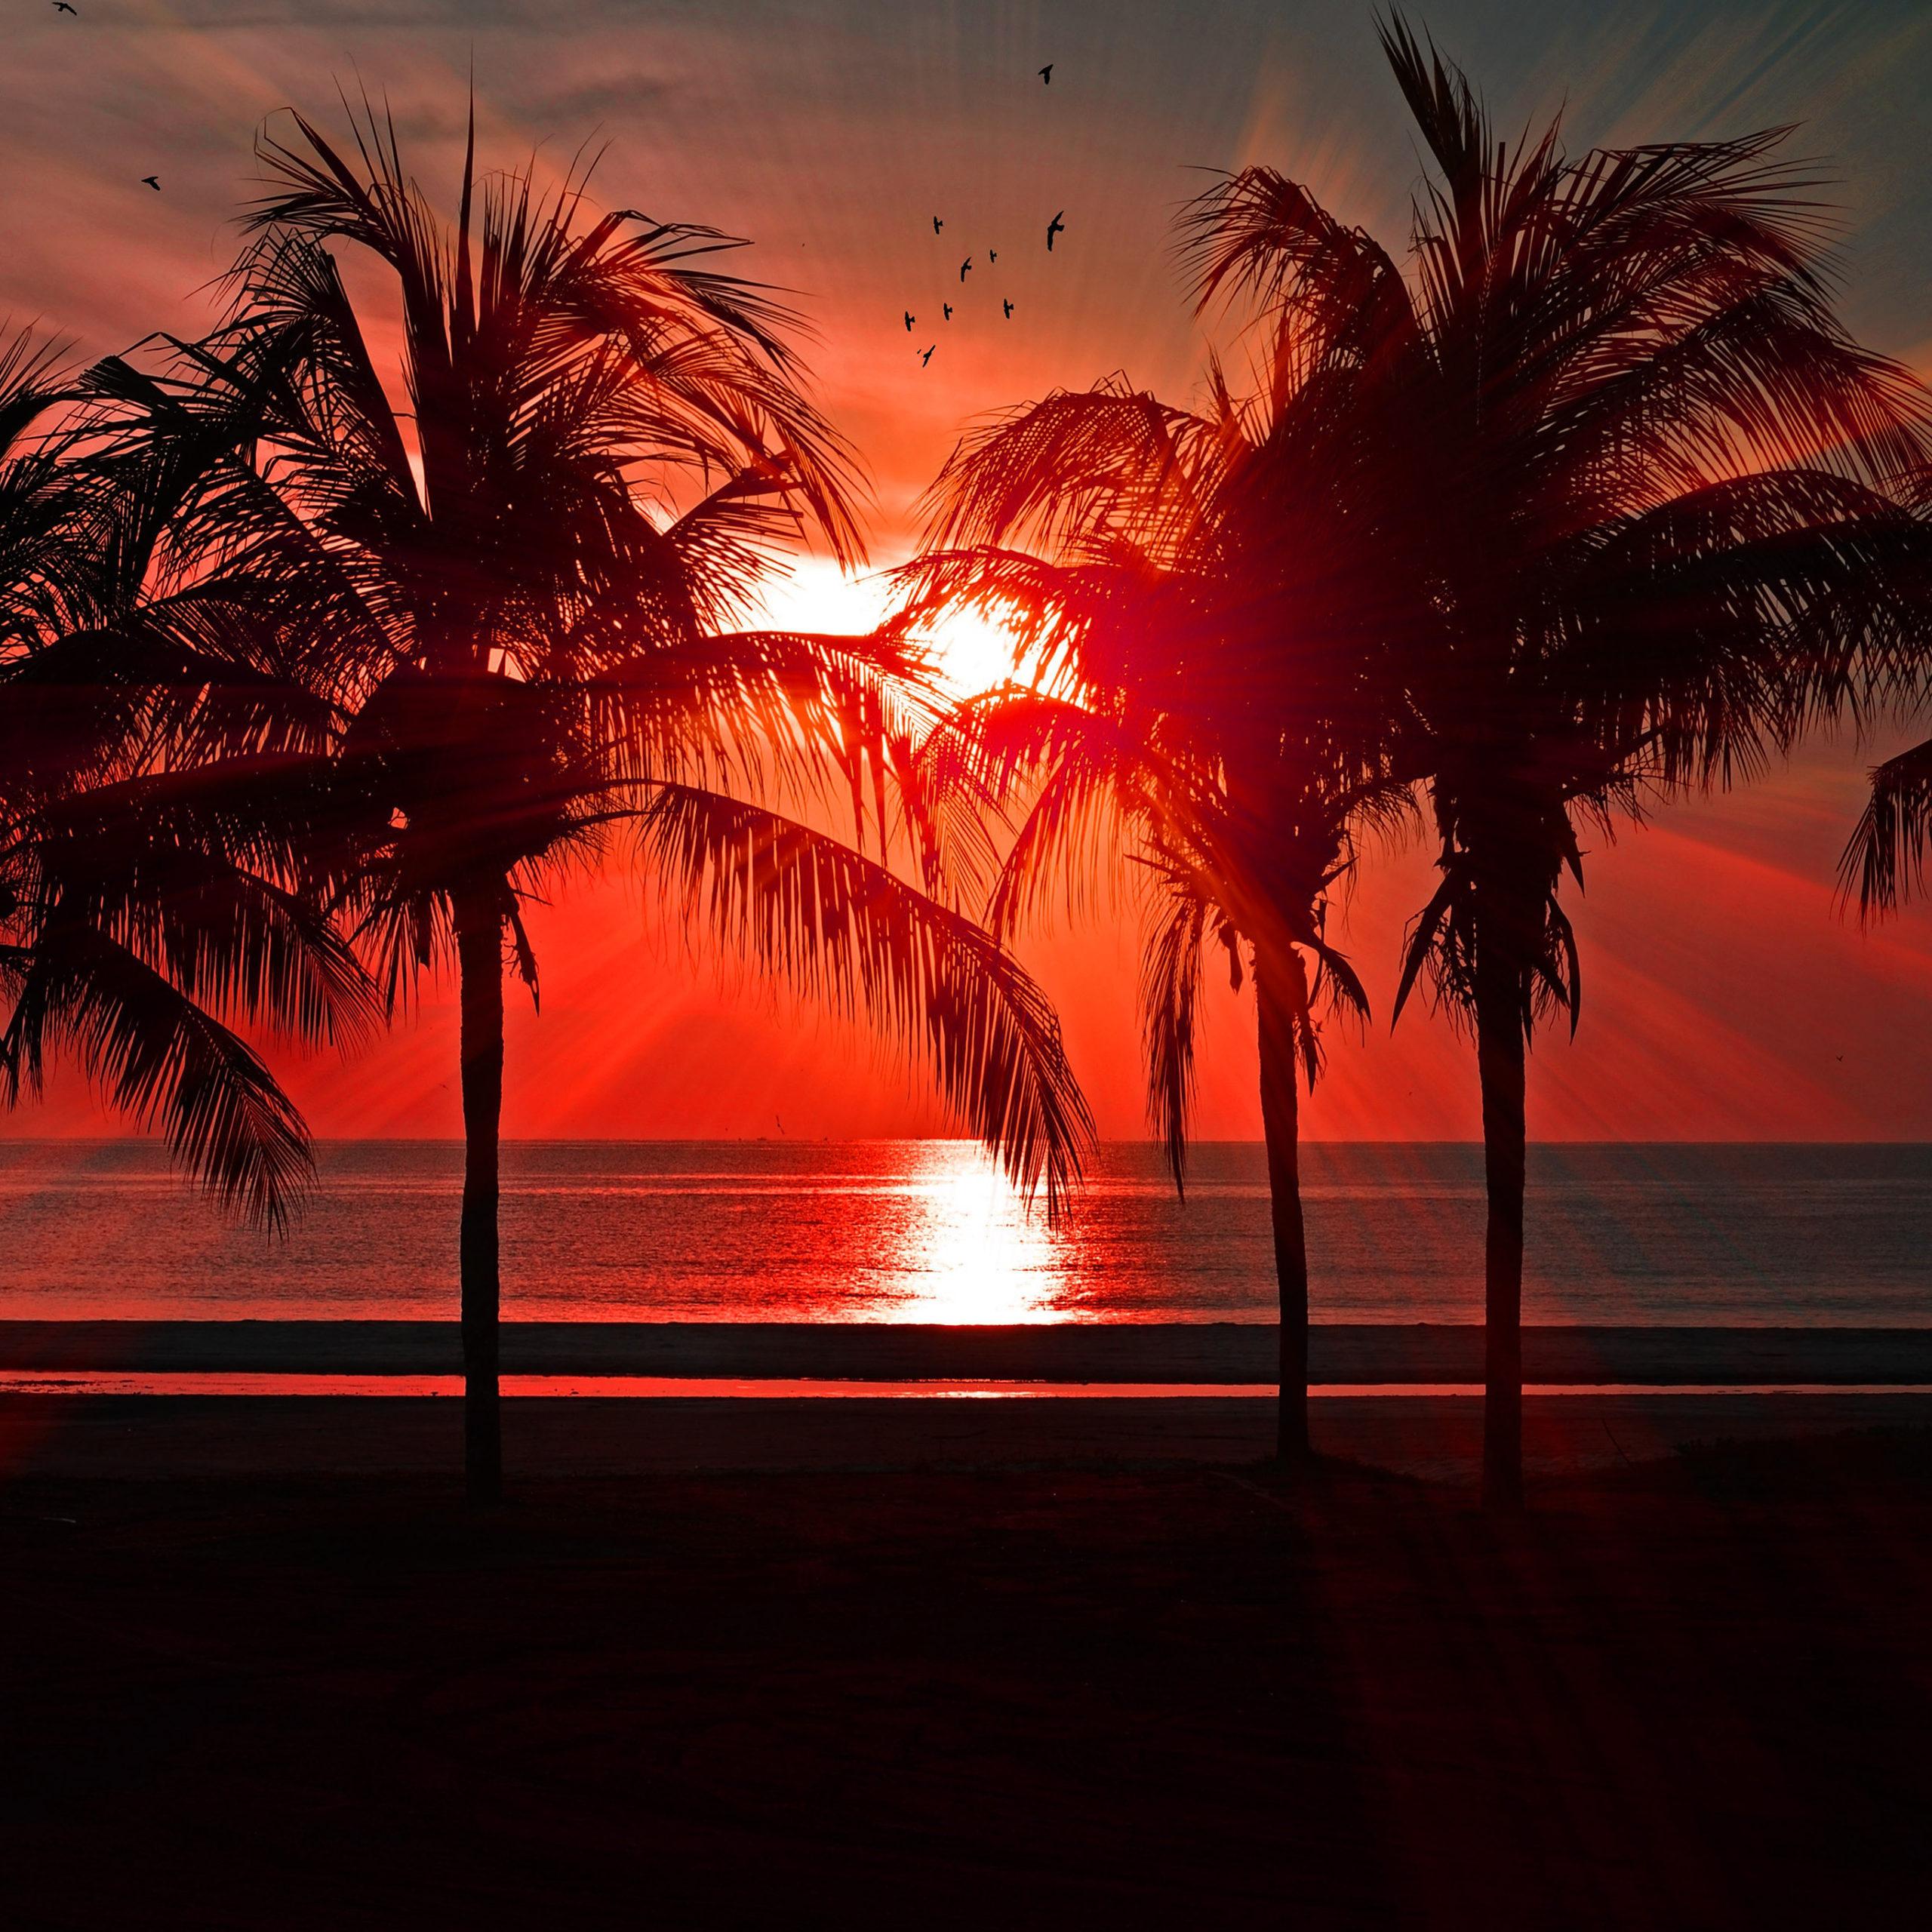 summer wallpaper iphone sunset palm trees